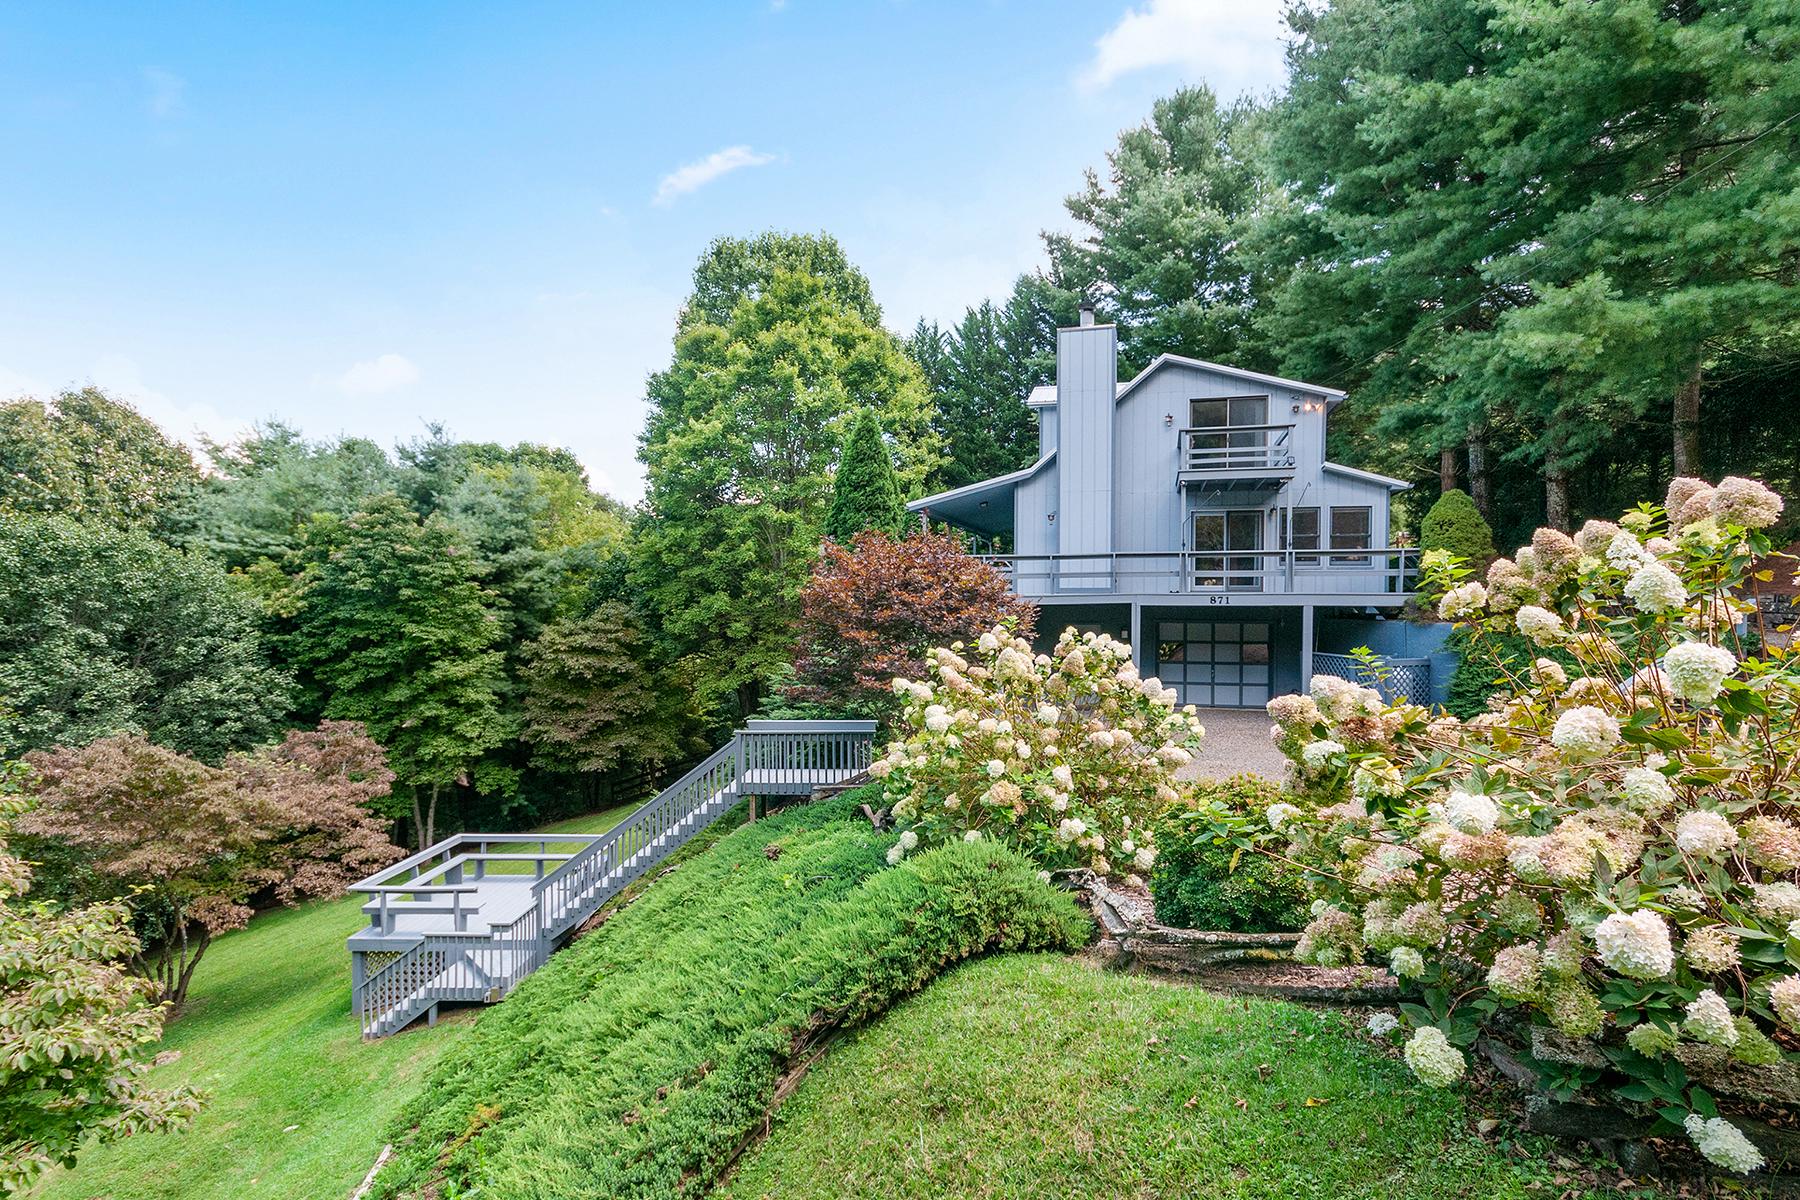 Single Family Homes for Active at WAYNESVILLE 871 Mountain Lake Dr Waynesville, North Carolina 28785 United States